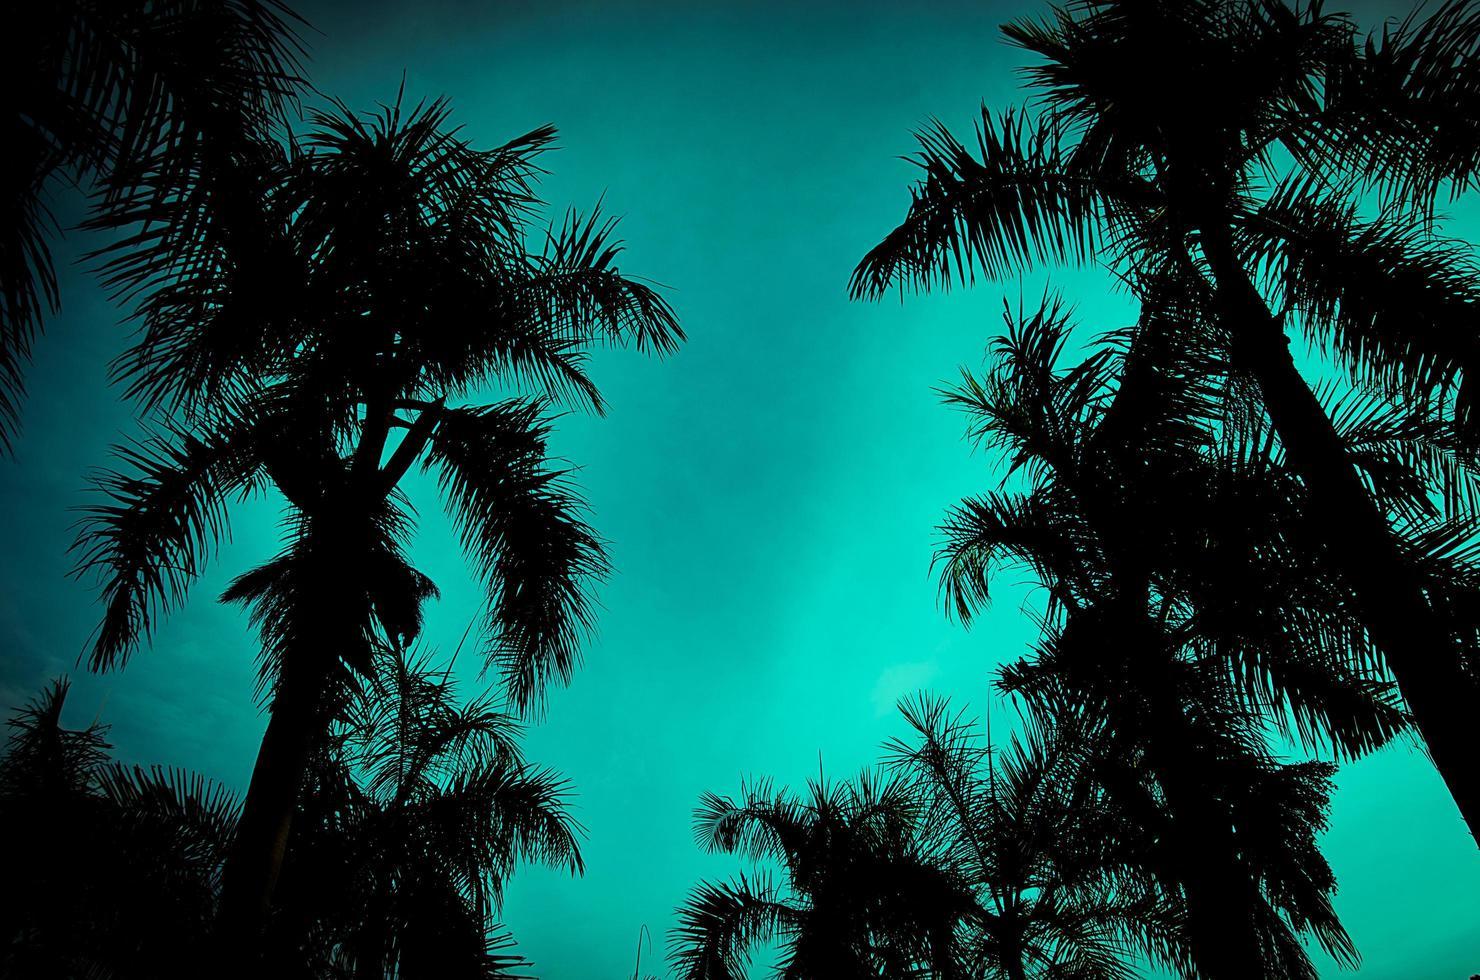 Palmen unter blauem Himmel foto